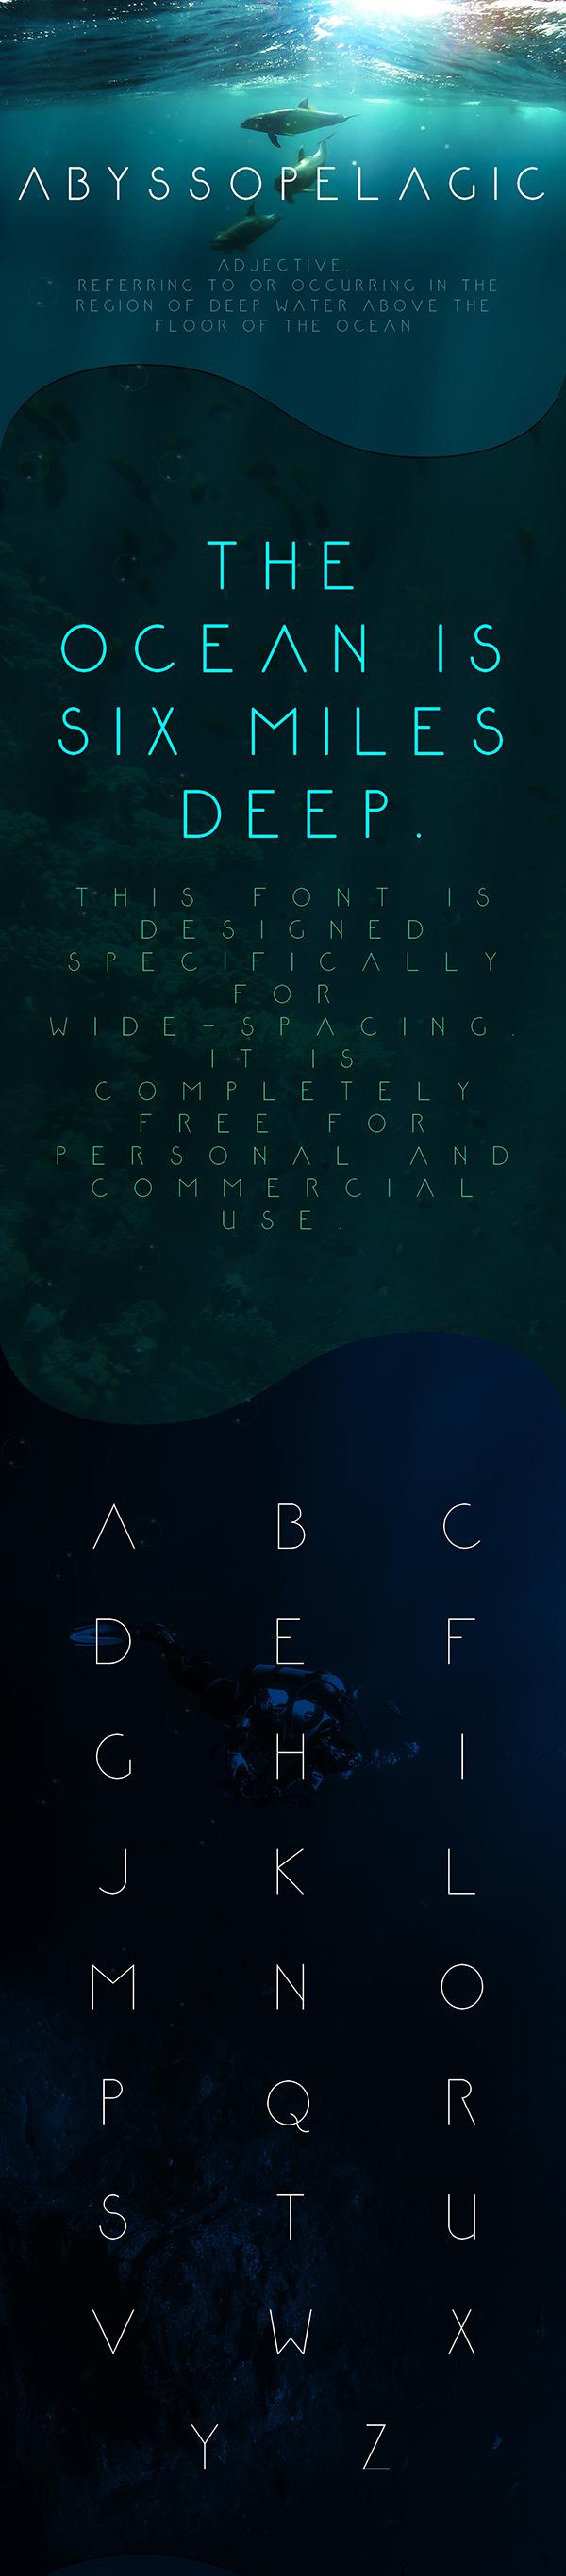 01 Abyssopelagic Free Font